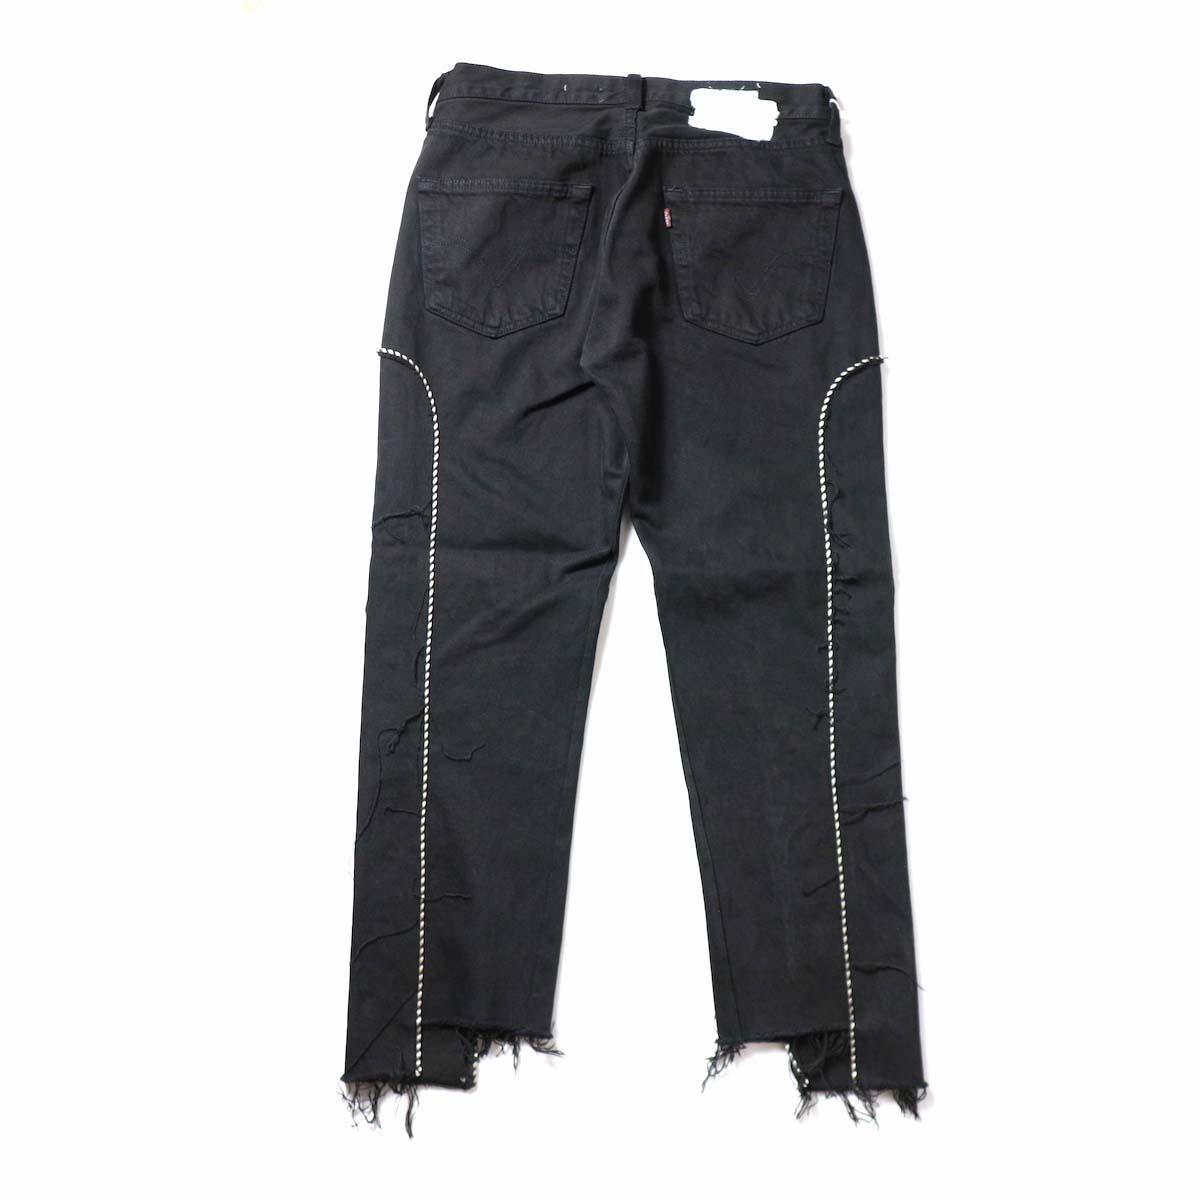 OLD PARK / Western Jeans Black (Msize-E)背面